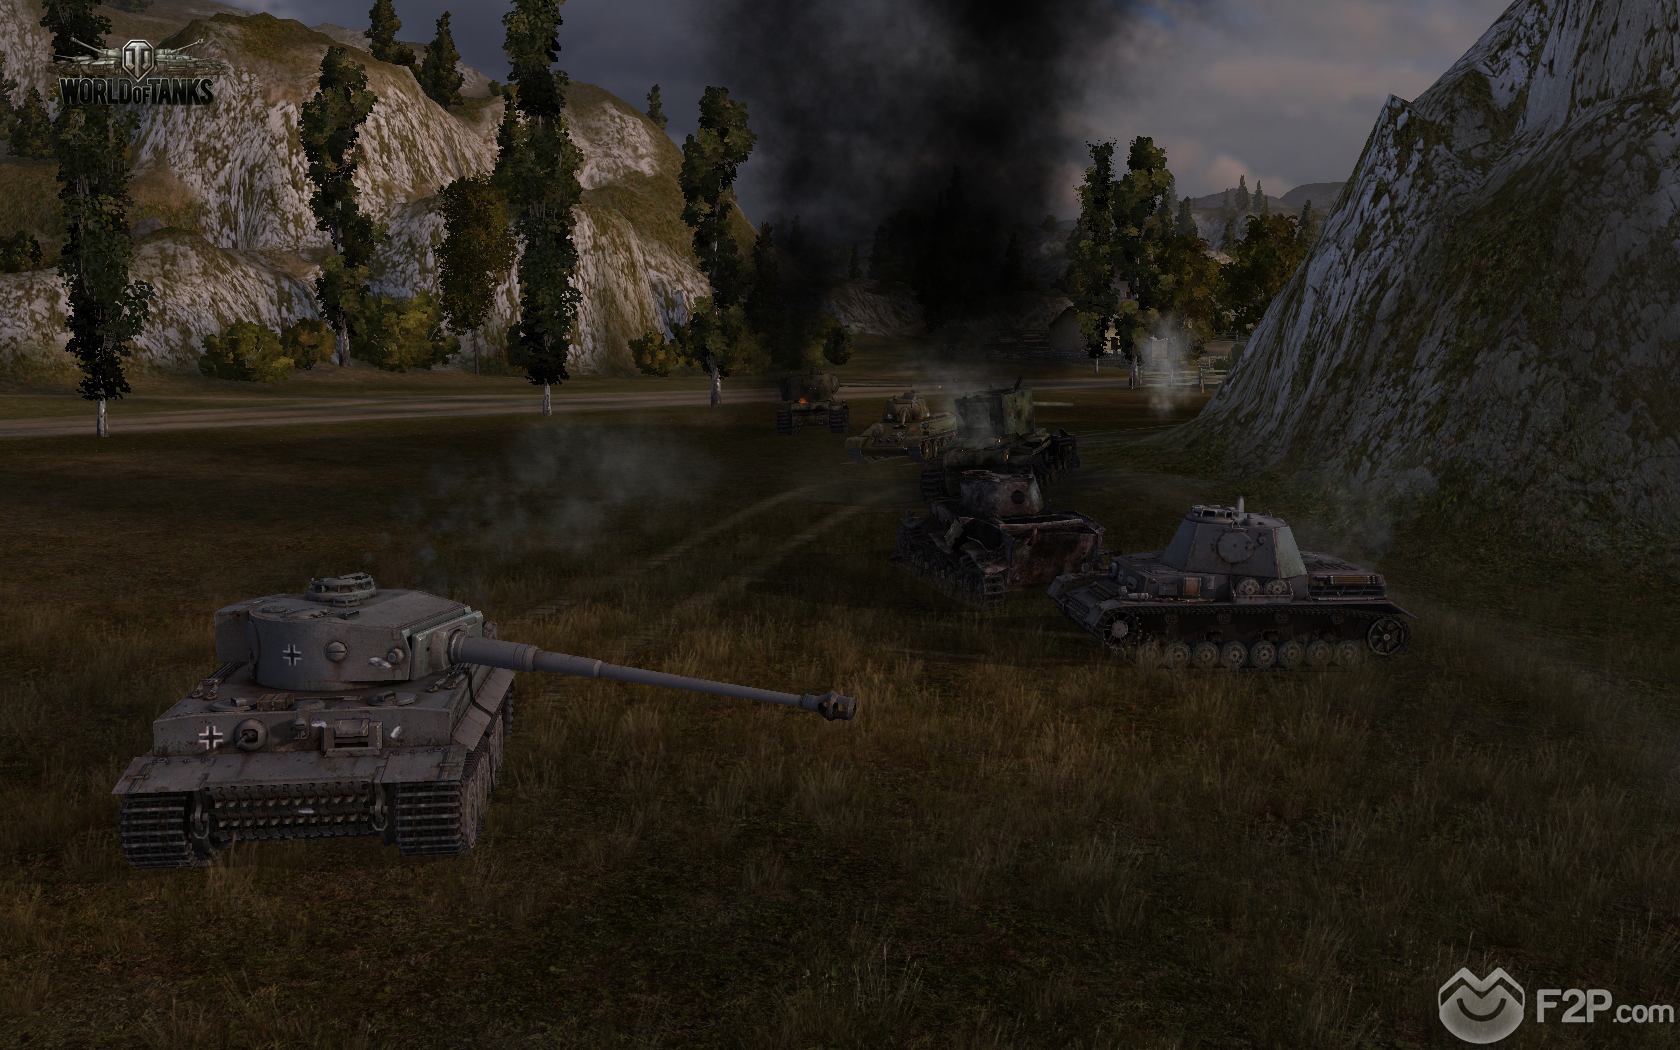 Click image for larger version.Name:World of Tanks 71.jpgViews:224Size:1.32 MBID:3993